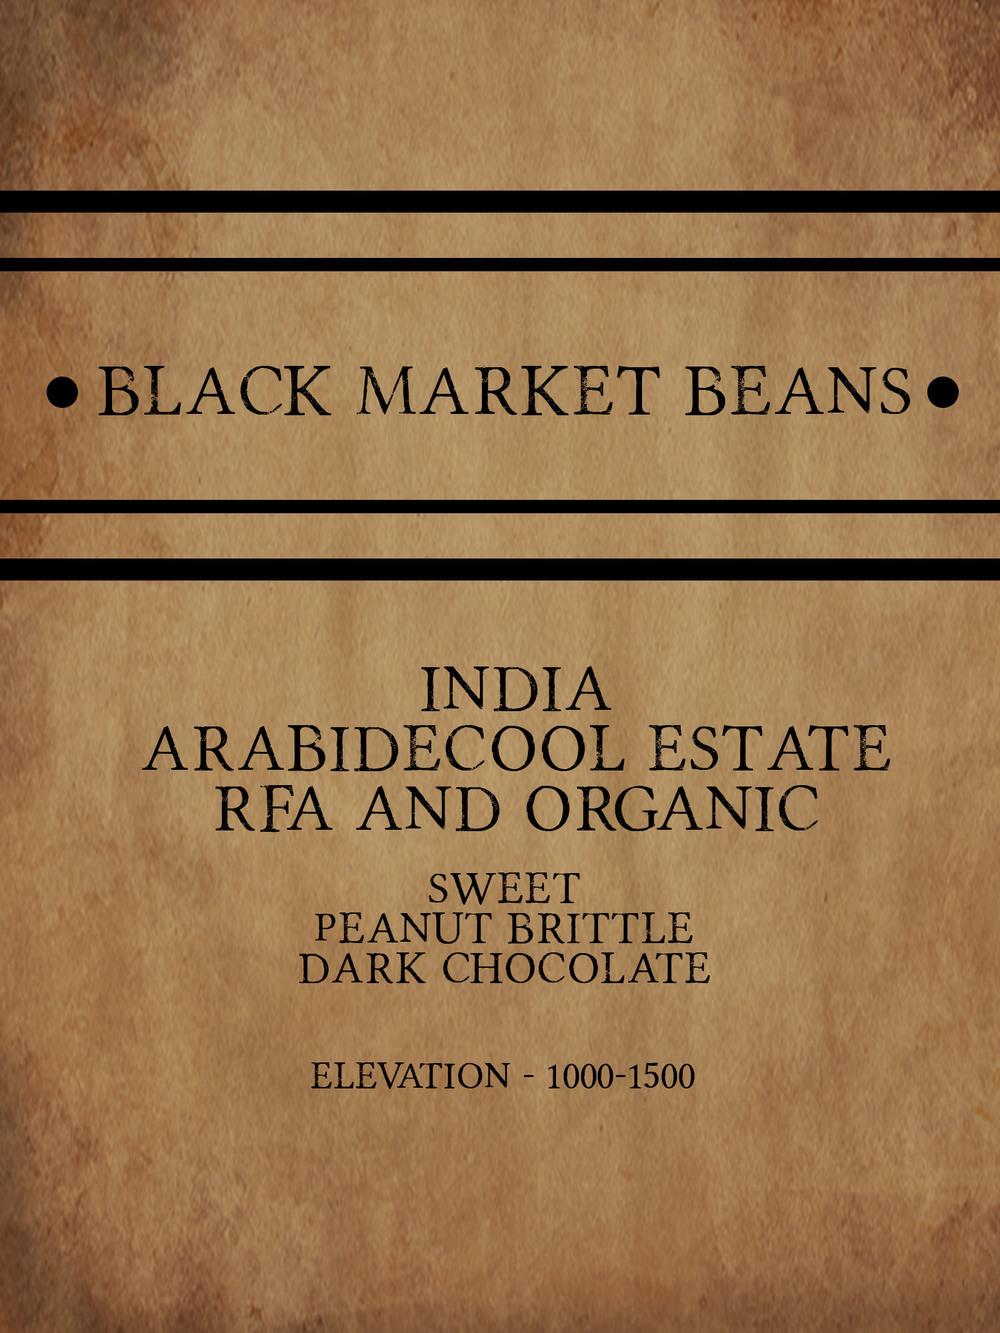 coffee_India_Arabidecool.jpg